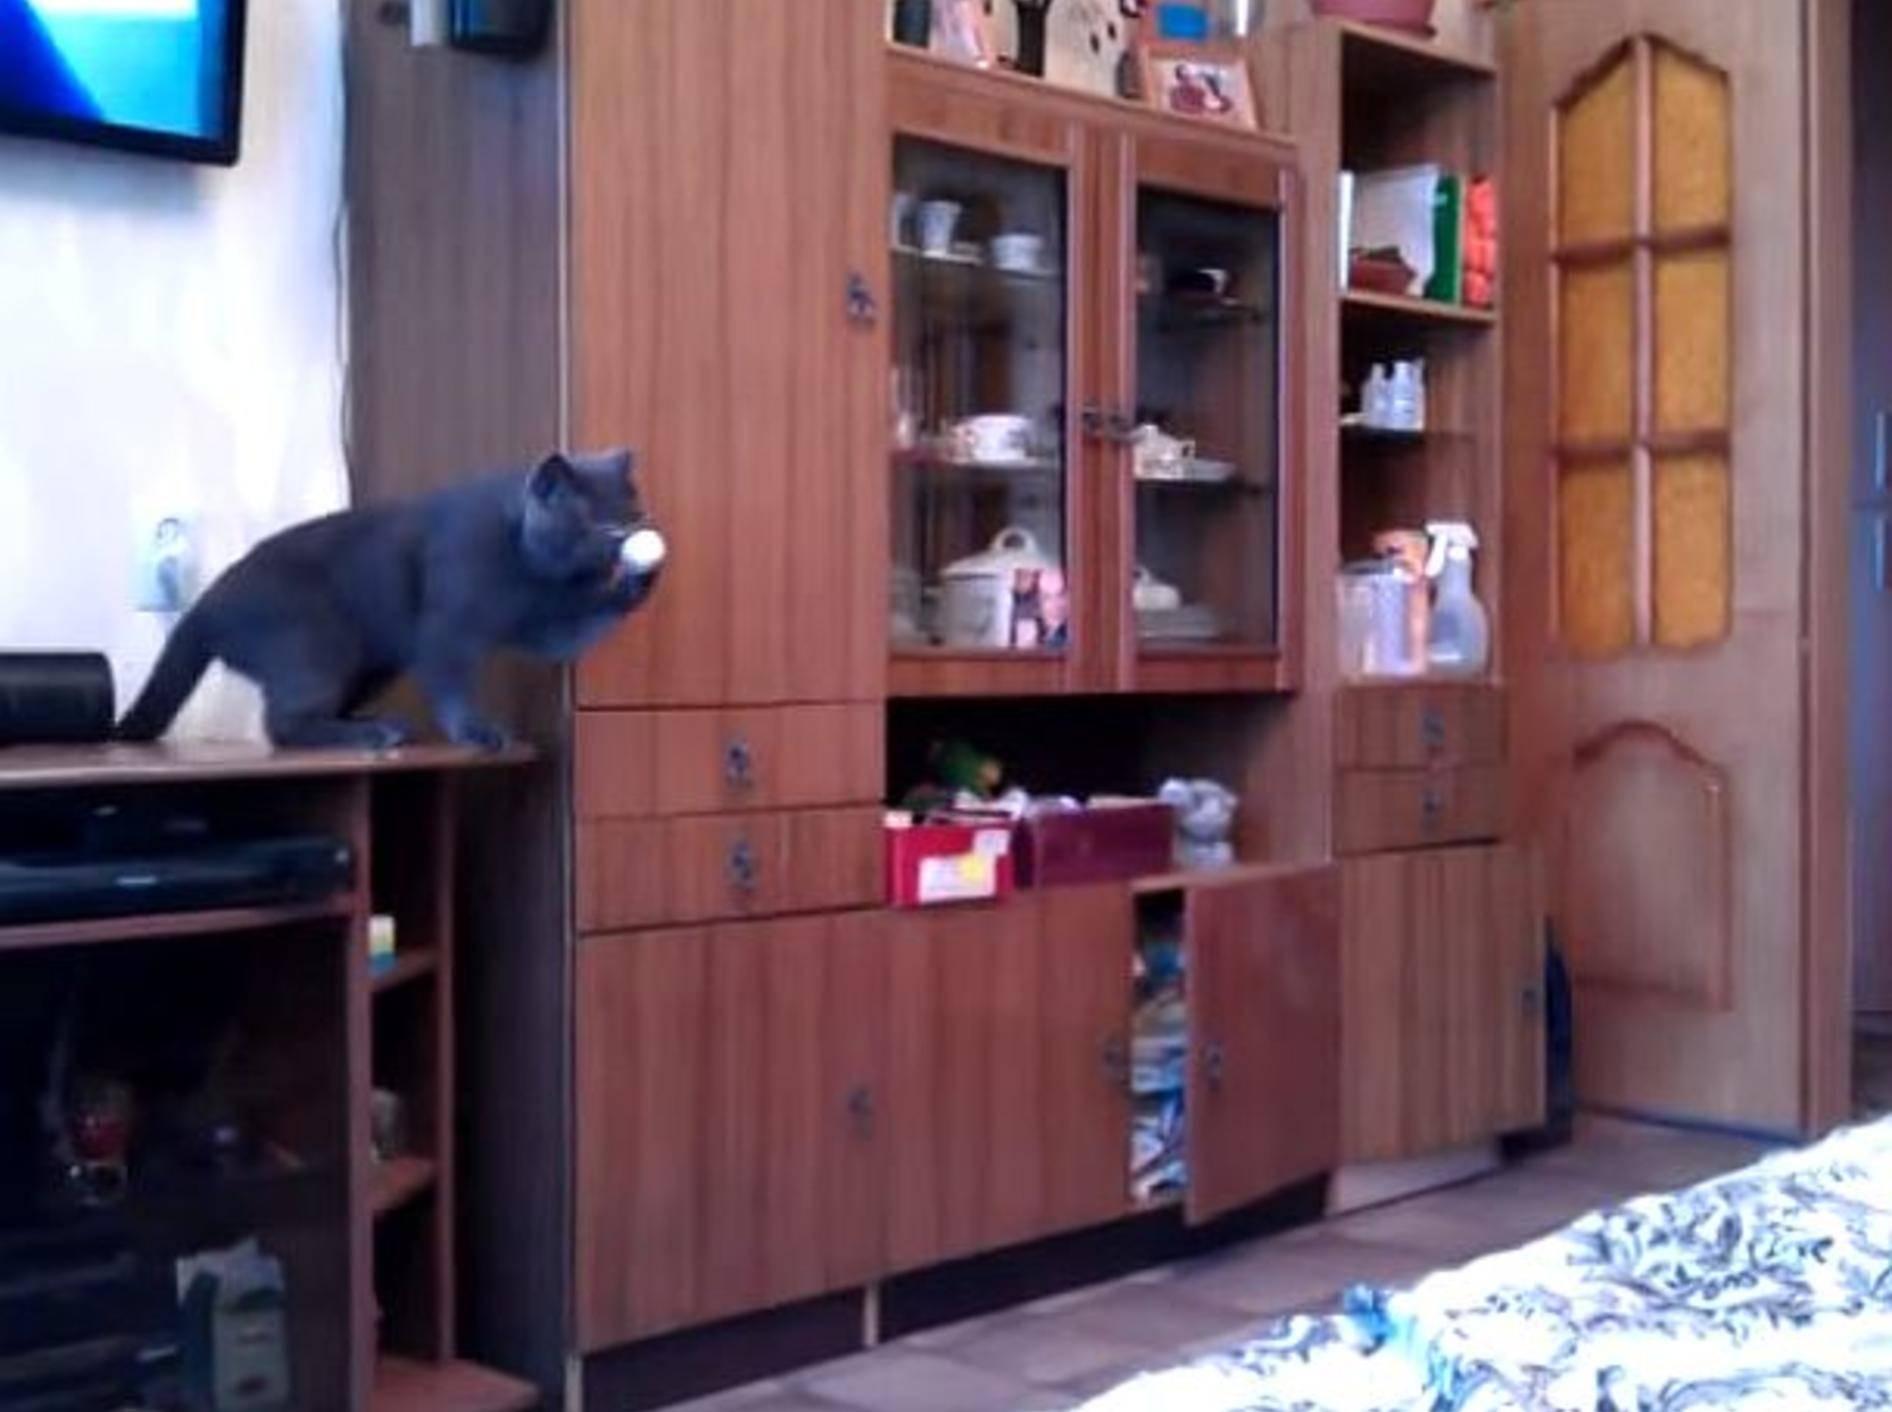 Süße graue Katze ist Ping-Pong-Profi – Bild: Youtube / RM Videos